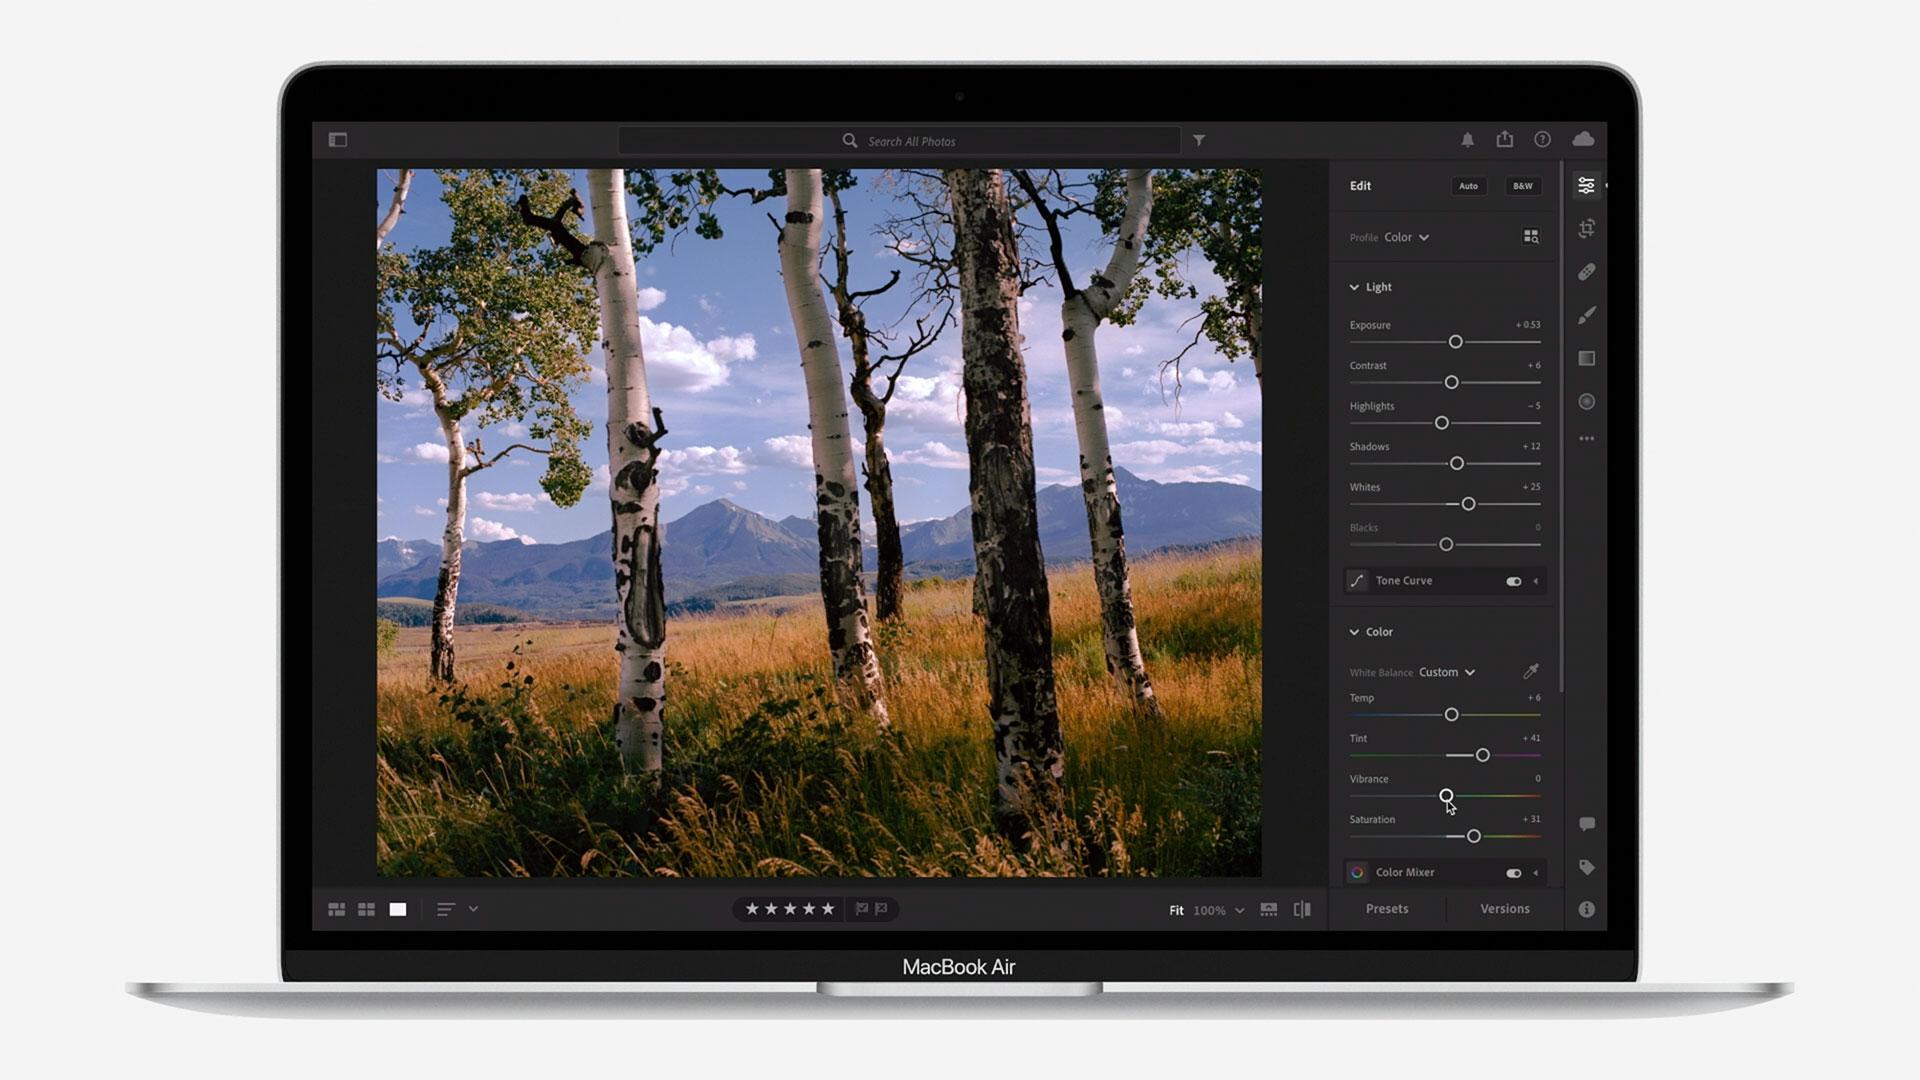 apple macbook air arm